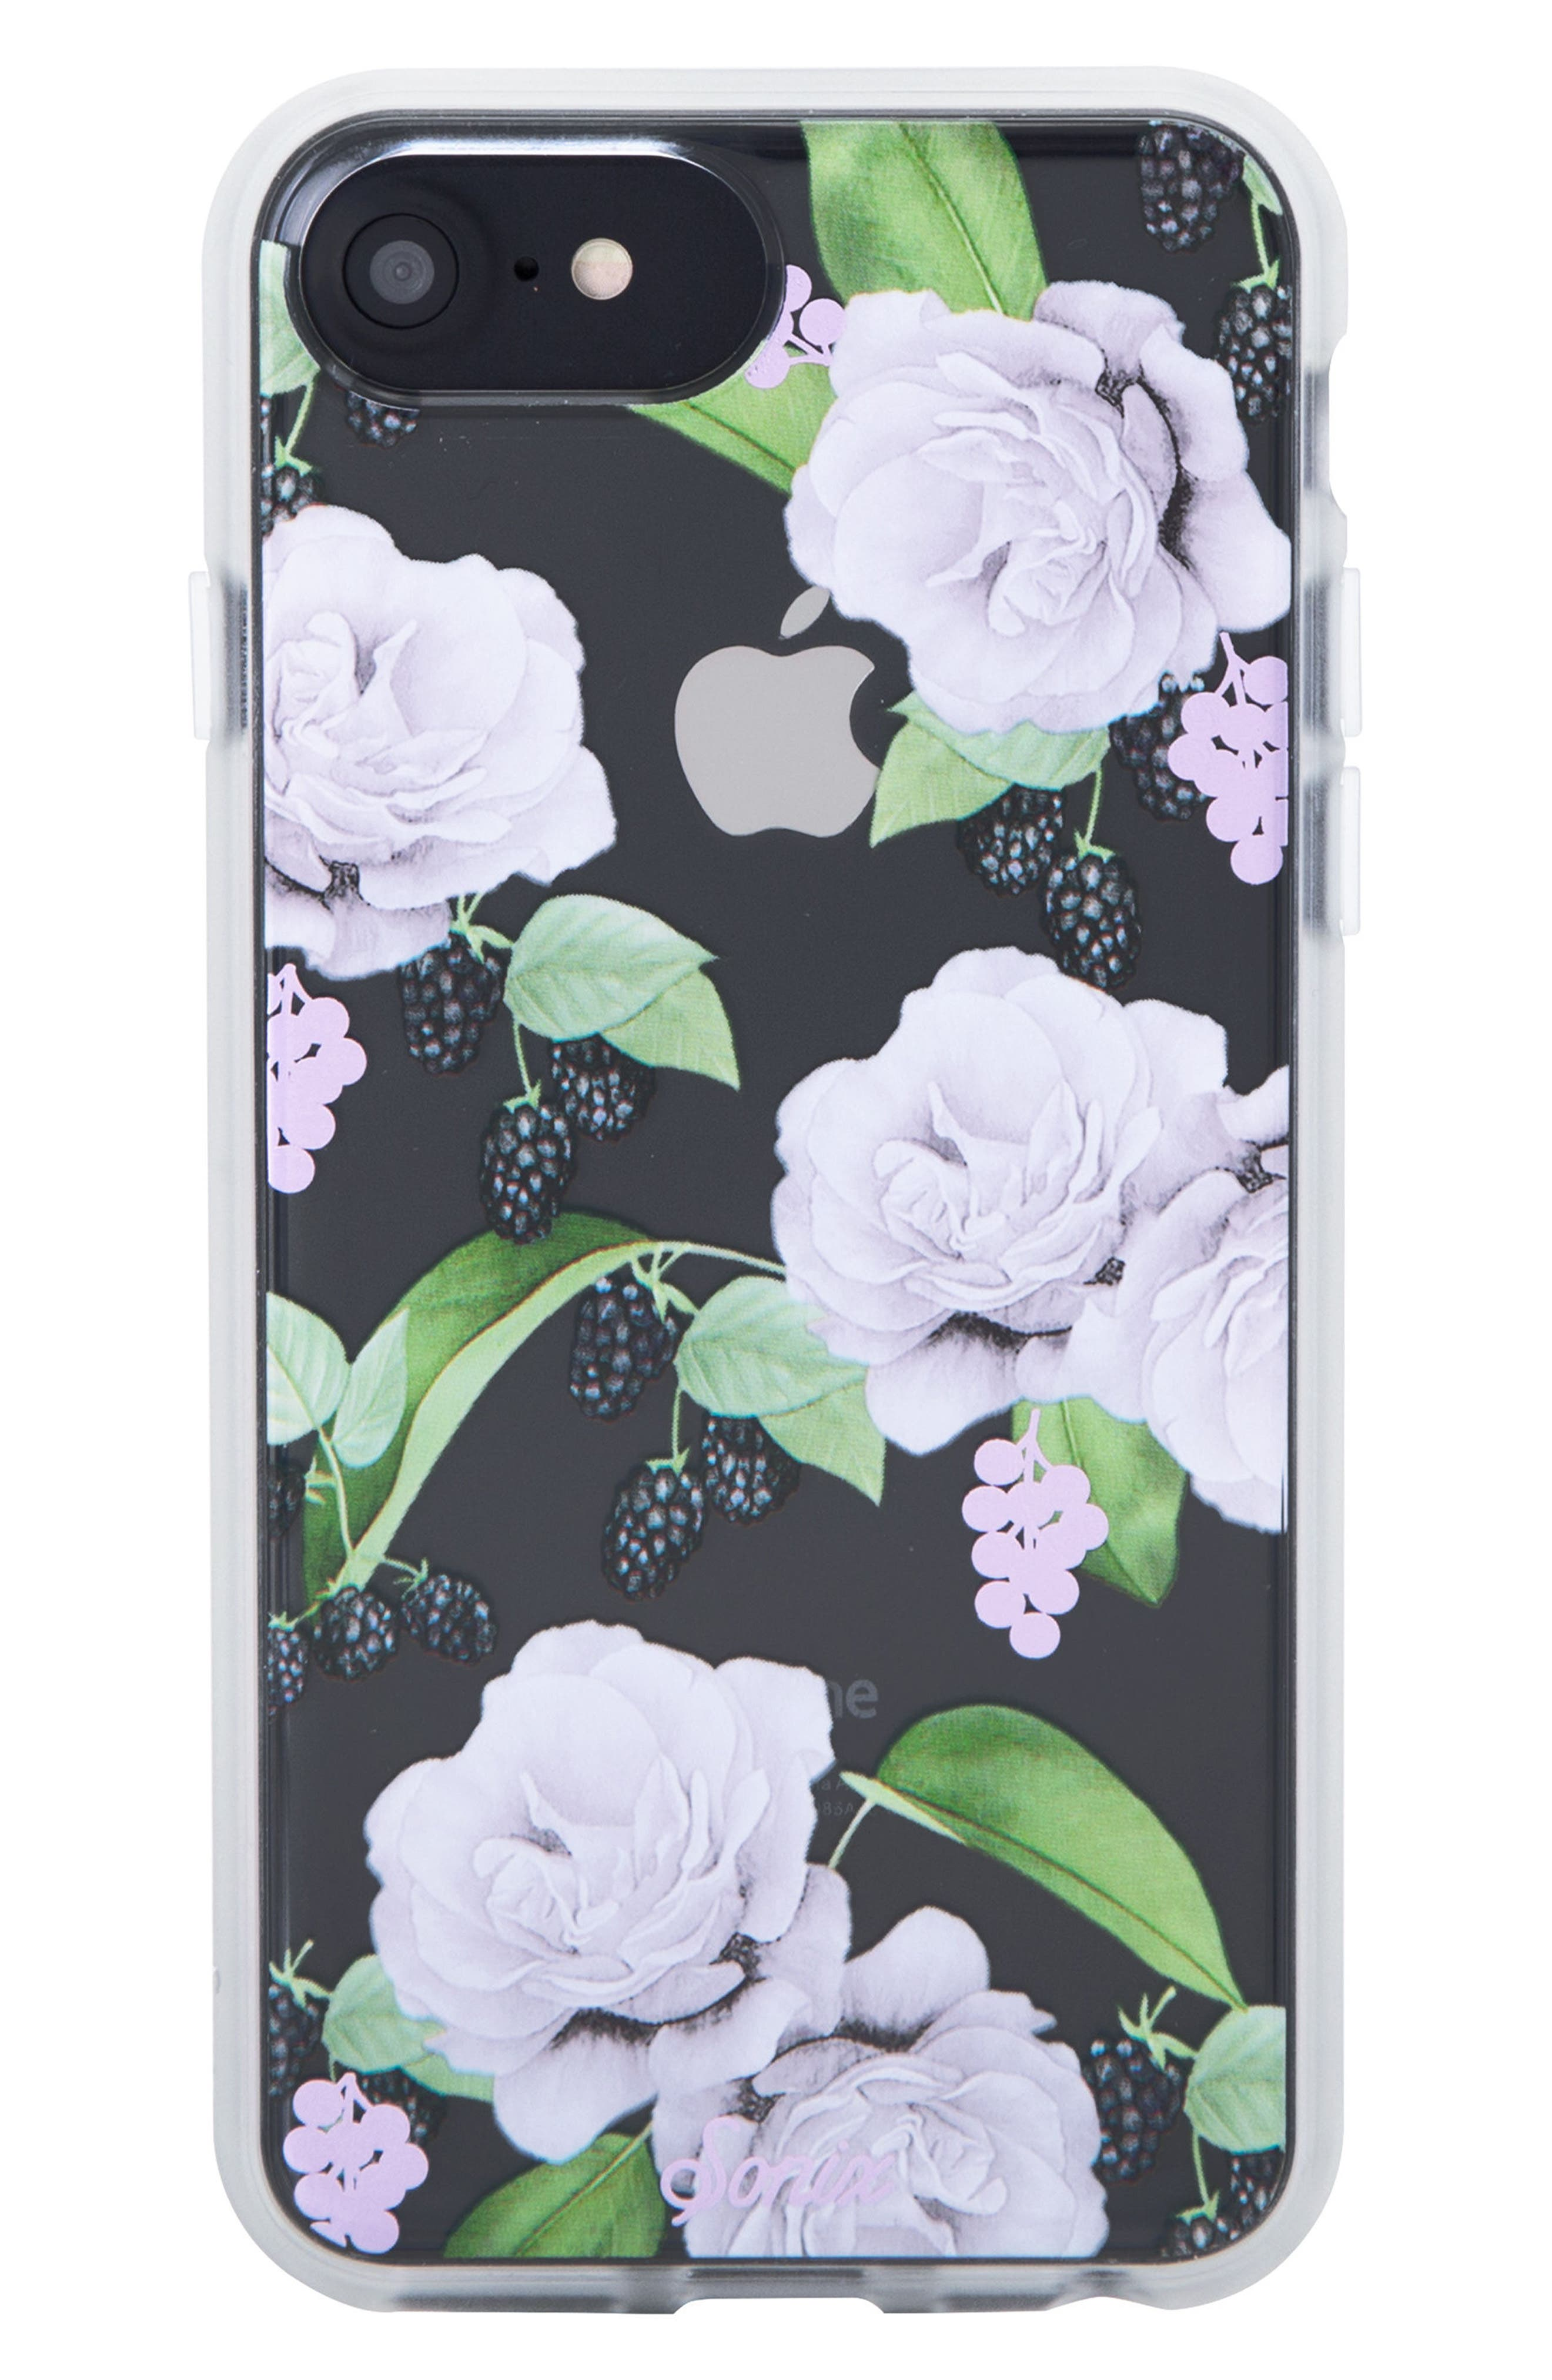 Floral Berry iPhone 6/6s/7/8 & 6/6s/7/8 Plus Case,                             Main thumbnail 1, color,                             WHITE/ LILAC